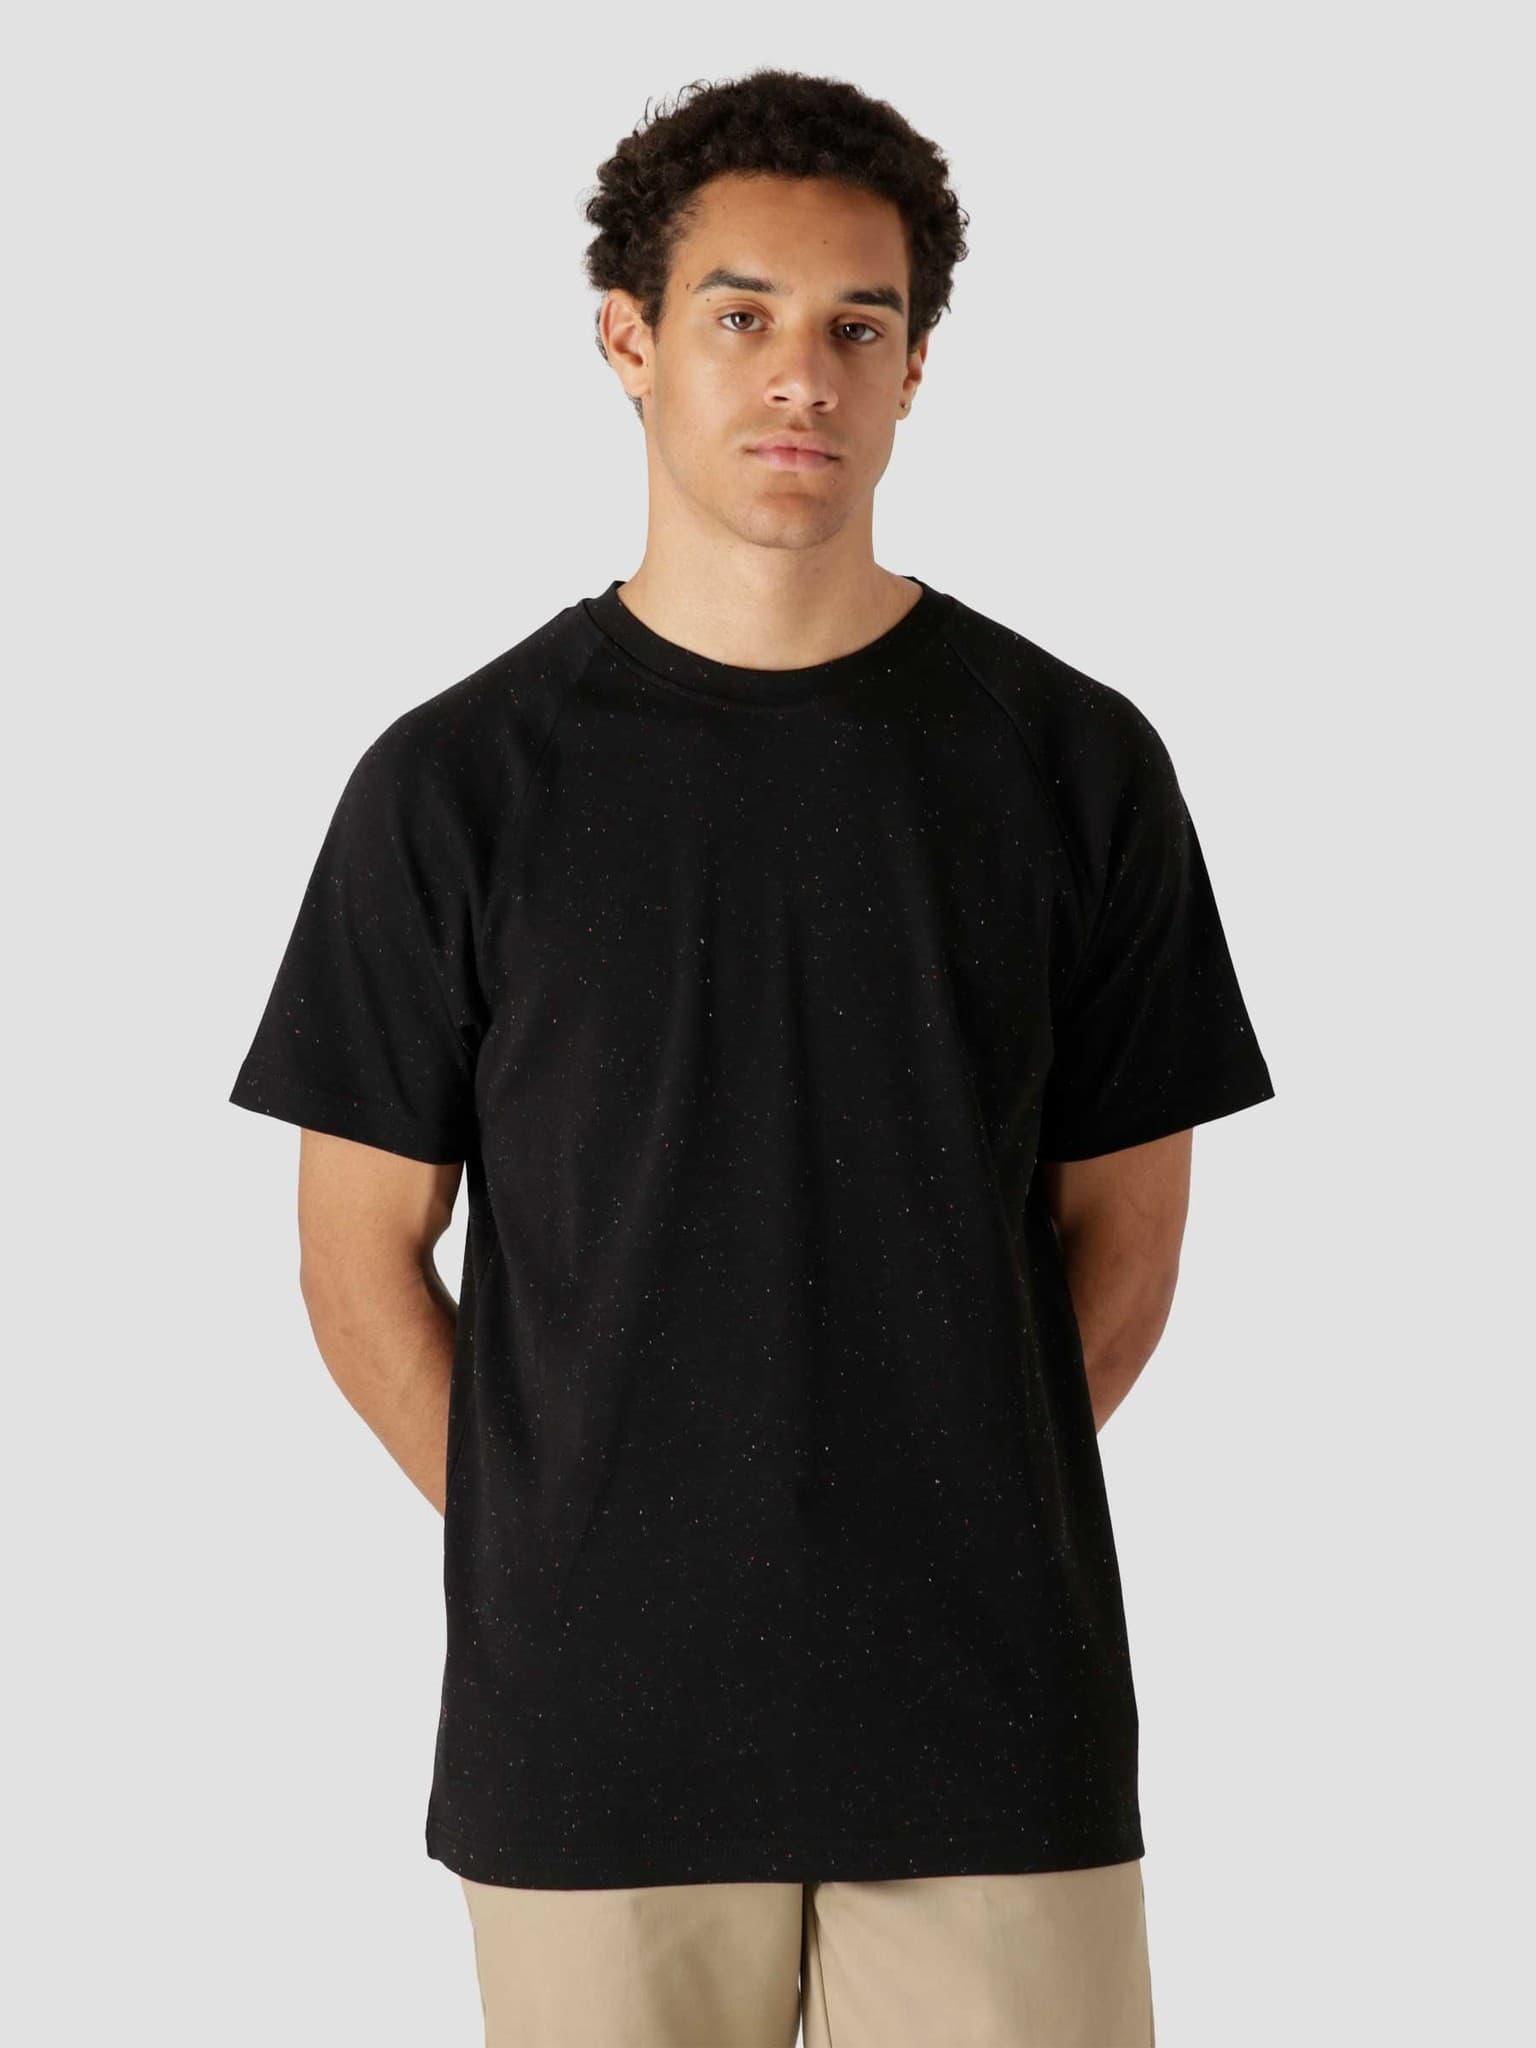 QB301 Speckle T-shirt Black